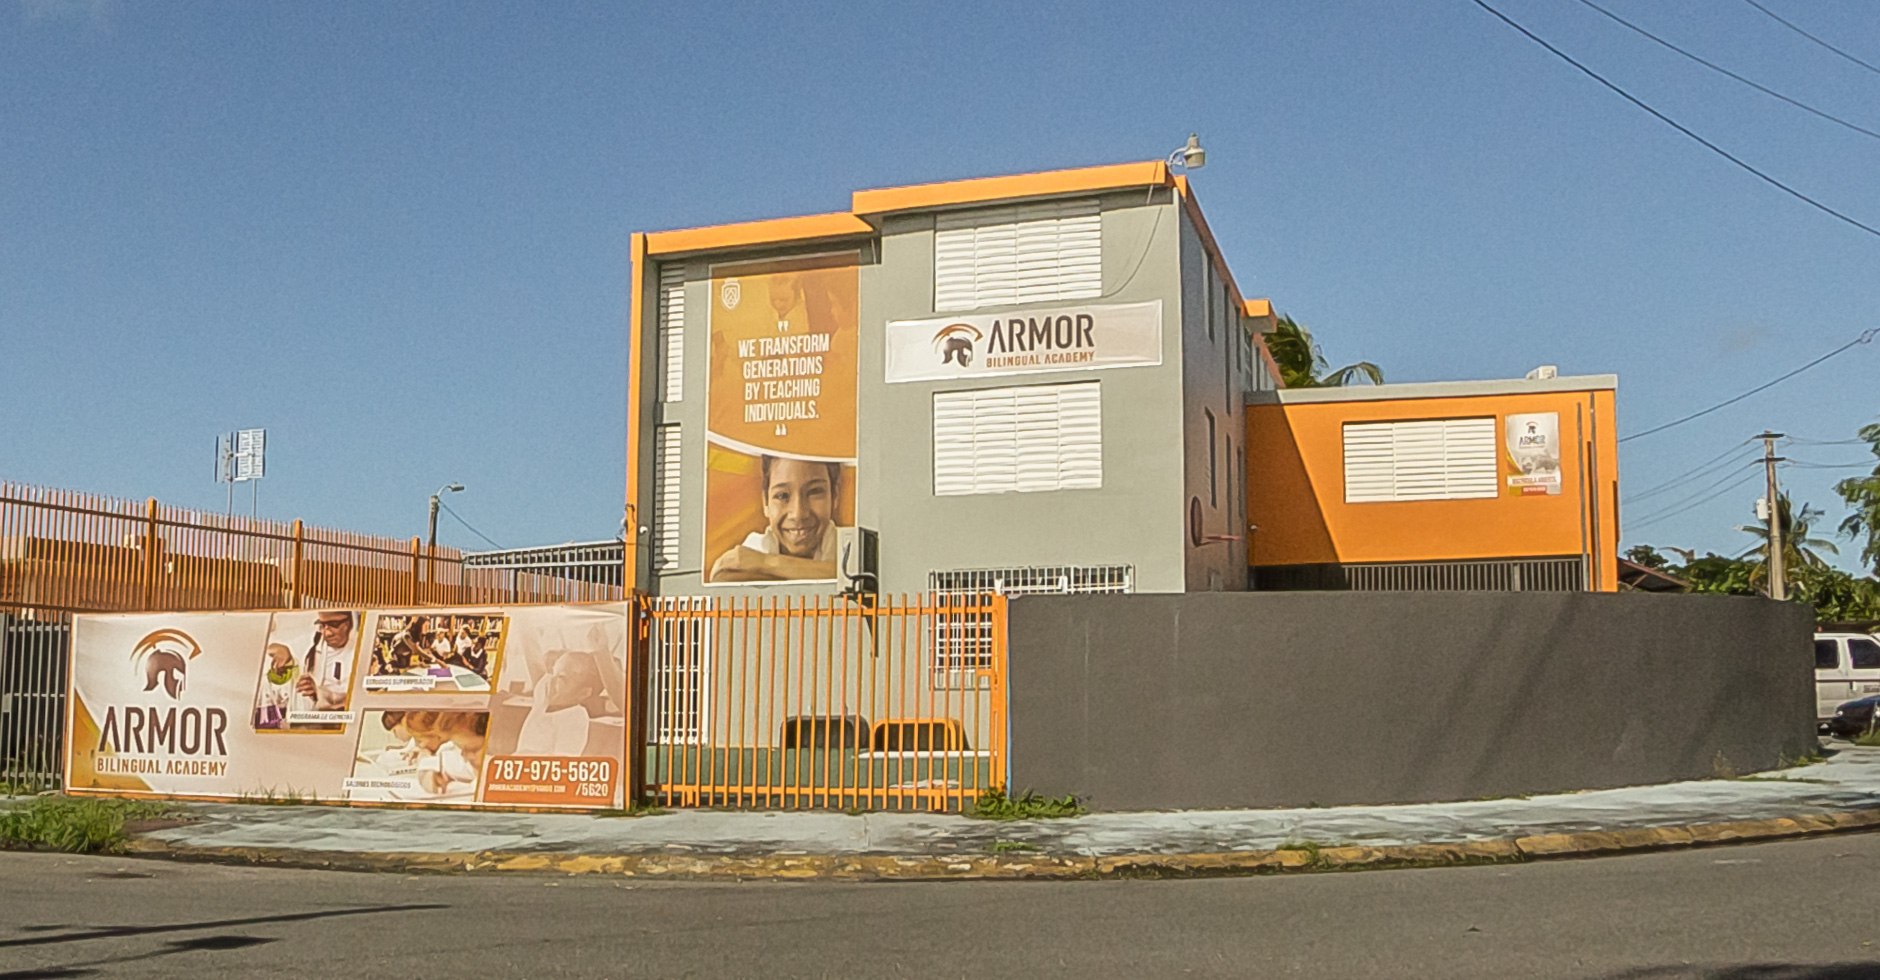 Armor Bilingual Academy